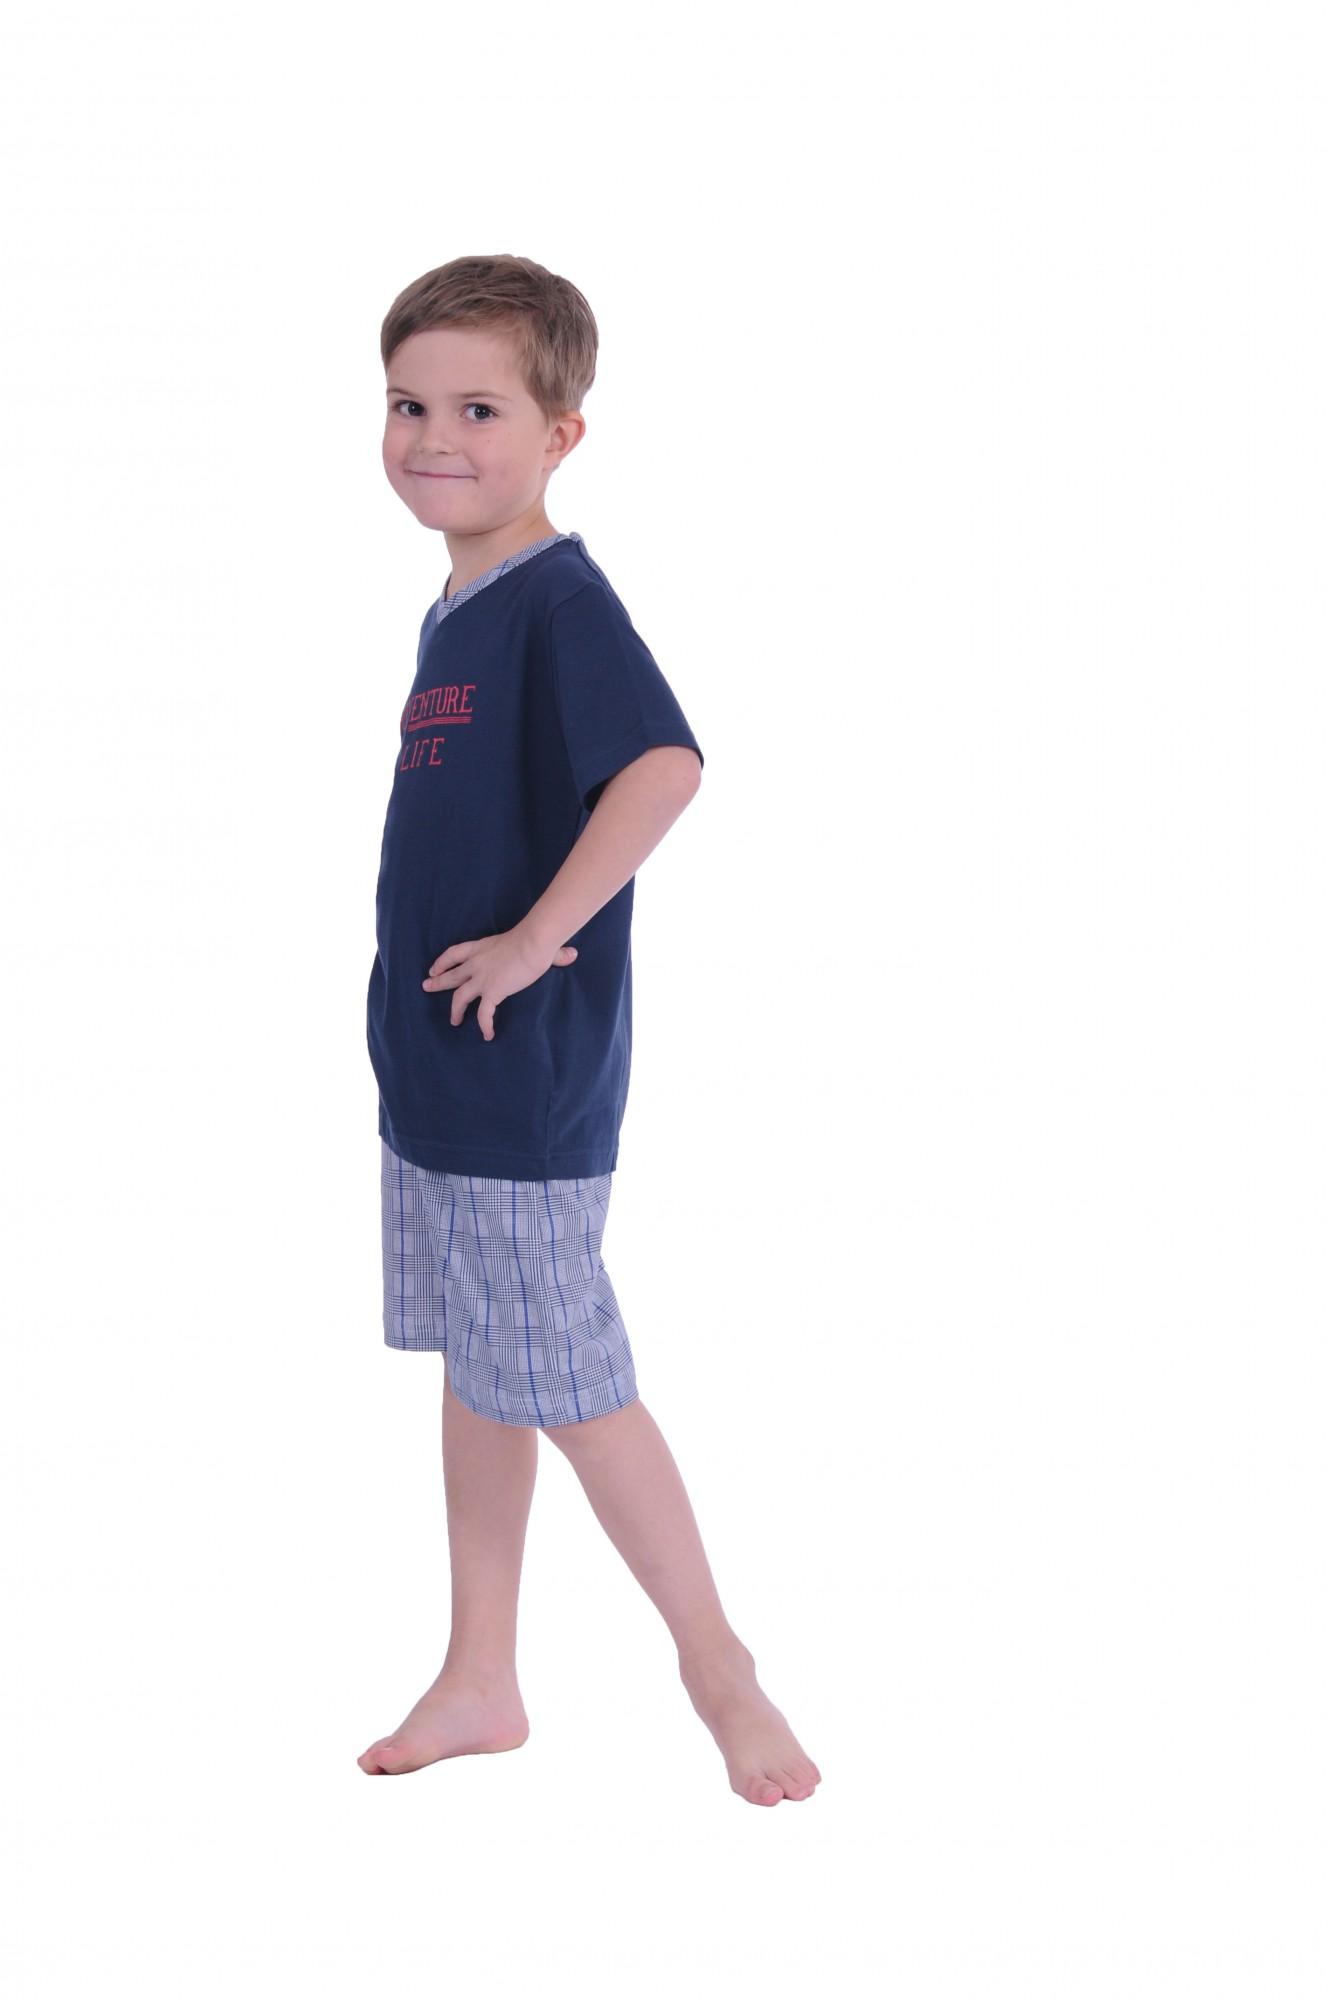 Jungen Kinder Shorty Pyjama kurzarm karierte Hose 171 505 90 500 – Bild 3